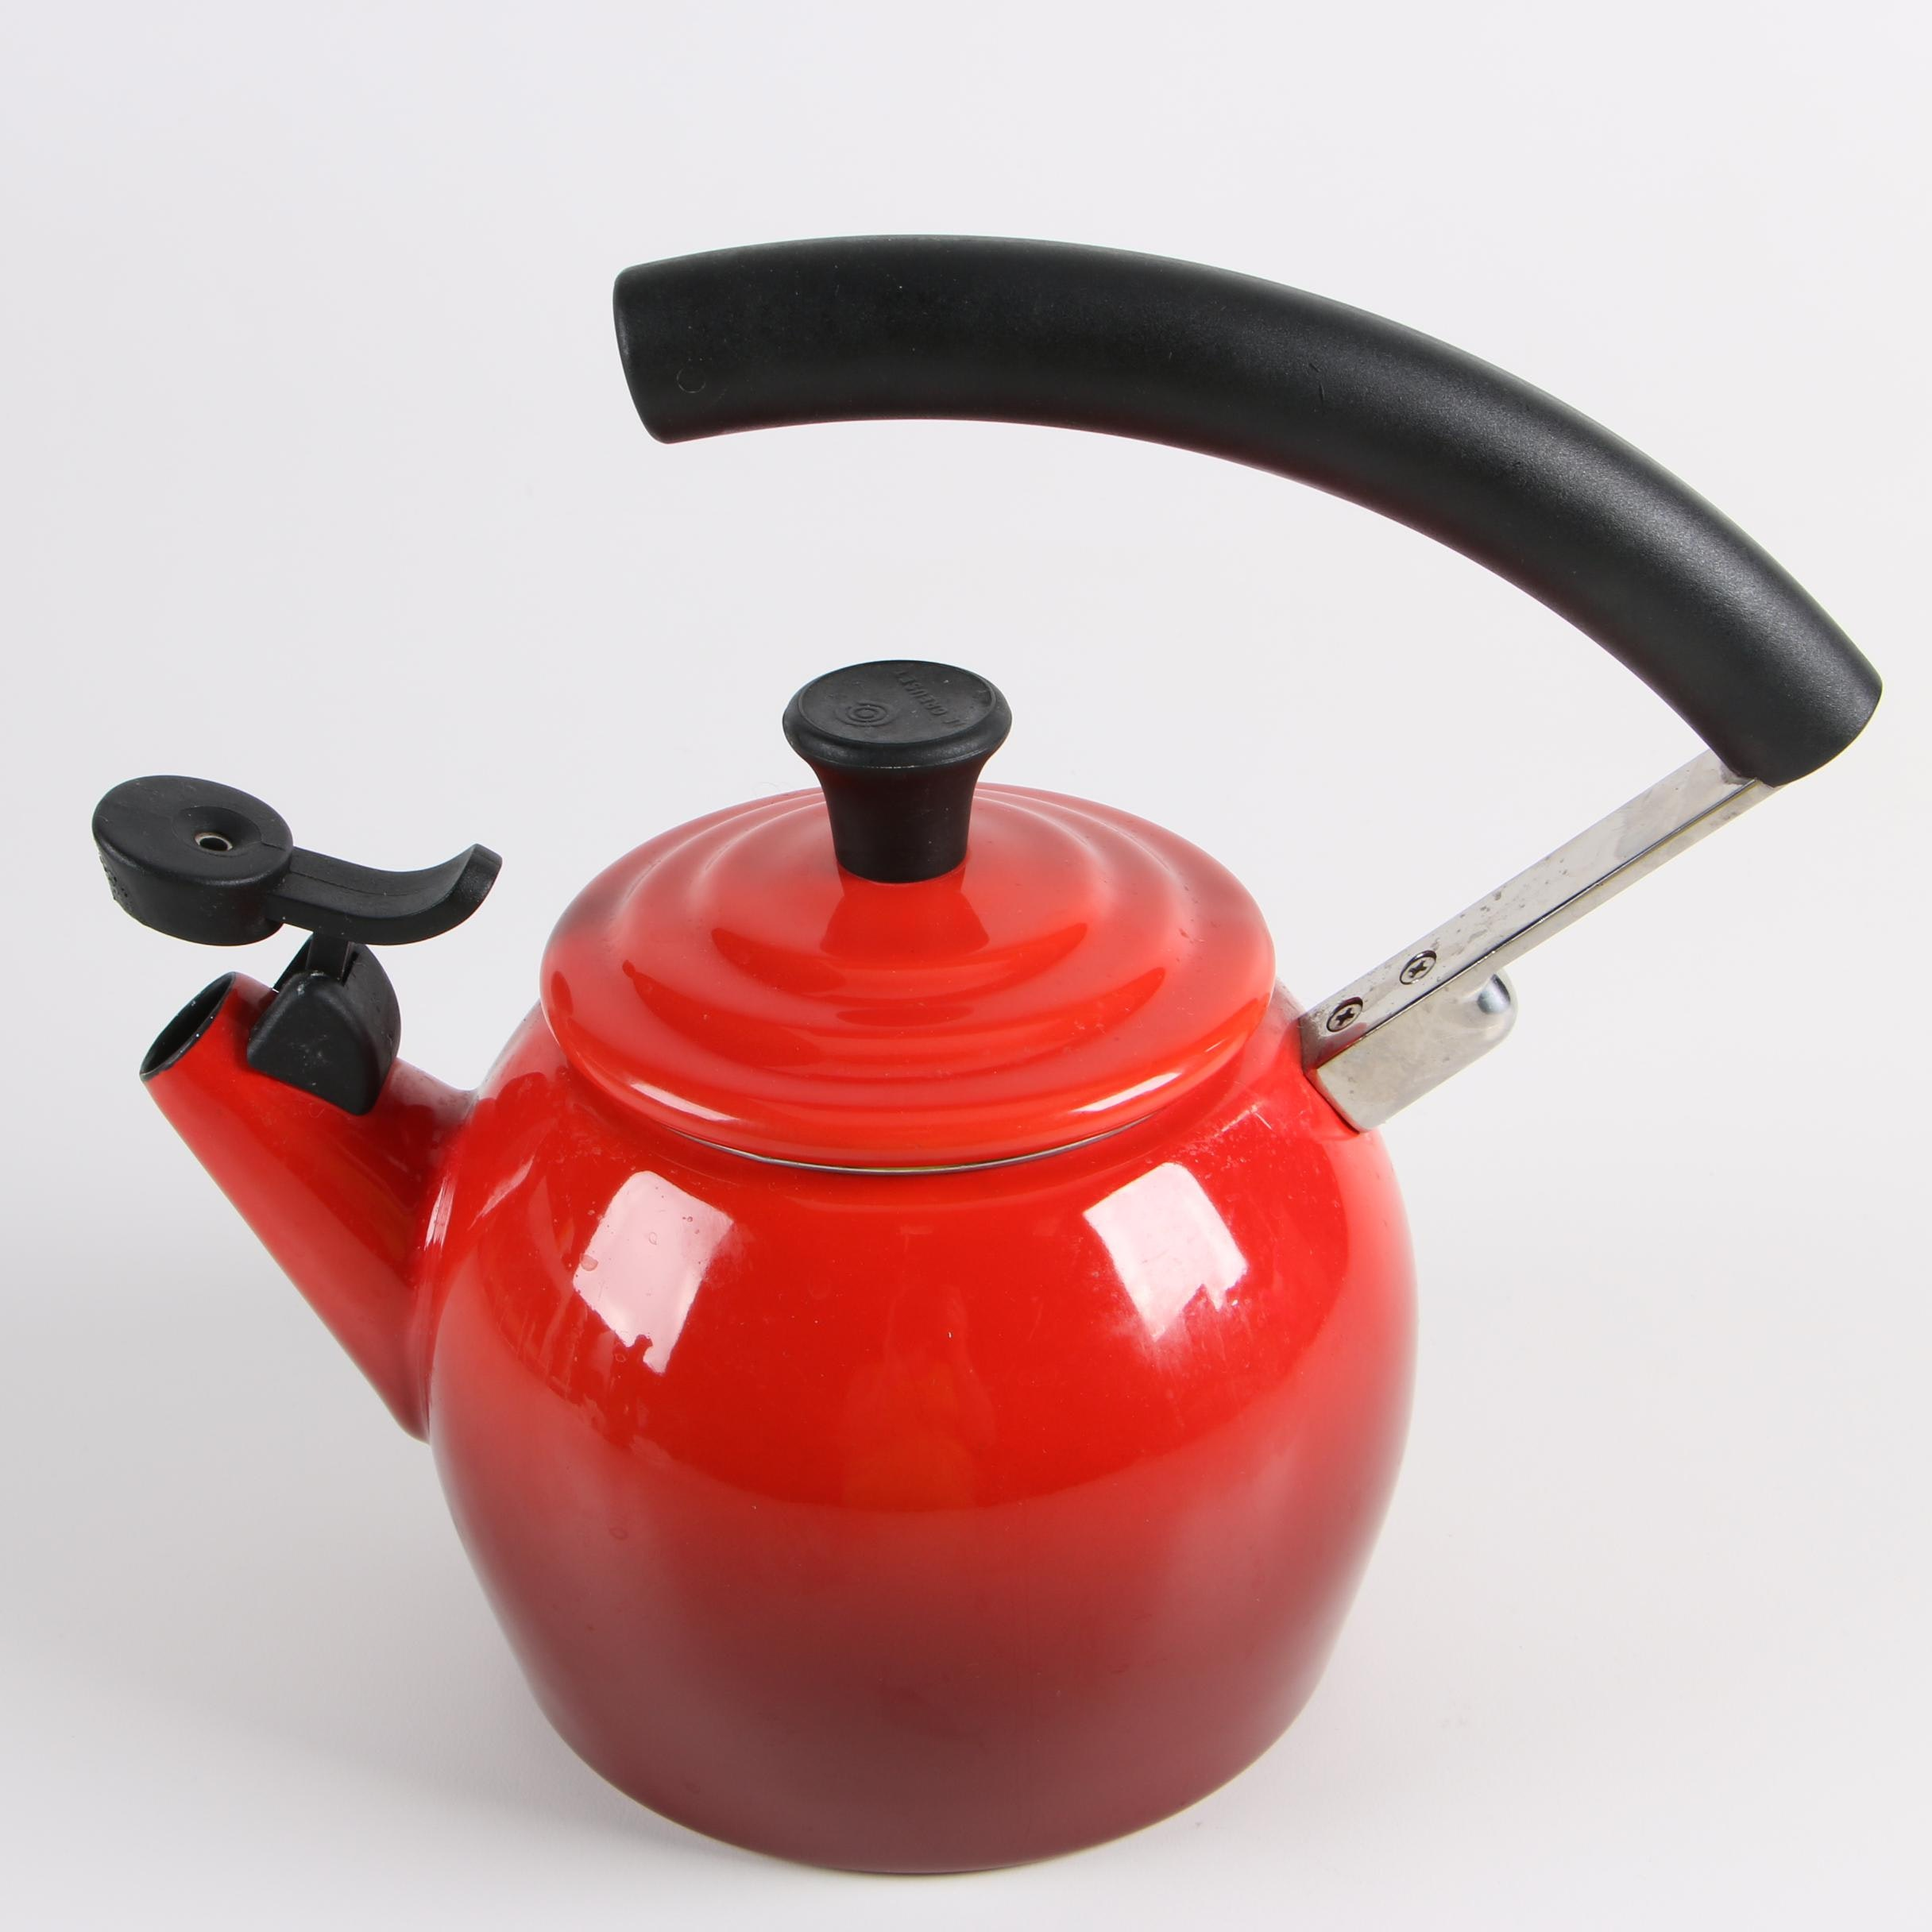 Le Creuset Red Enameled Tea Kettle